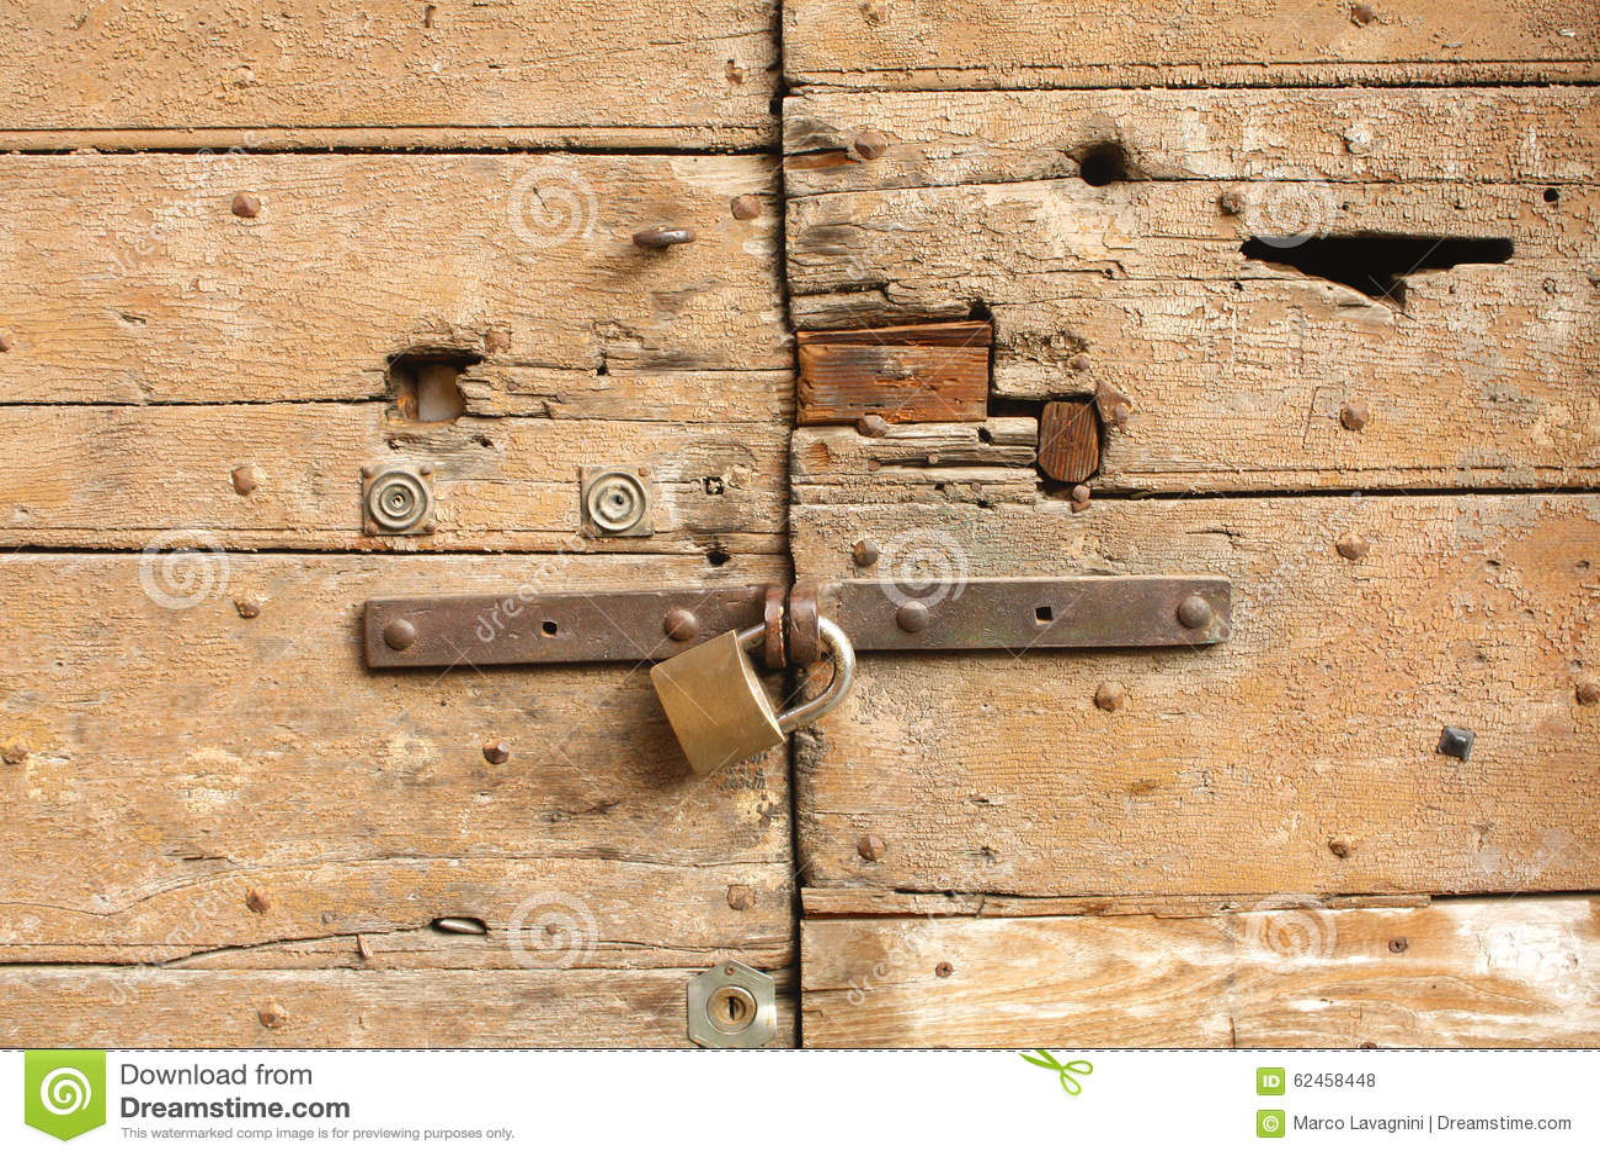 Verschlossene tür  Verschlossene Tür Stockfoto - Bild: 62458448